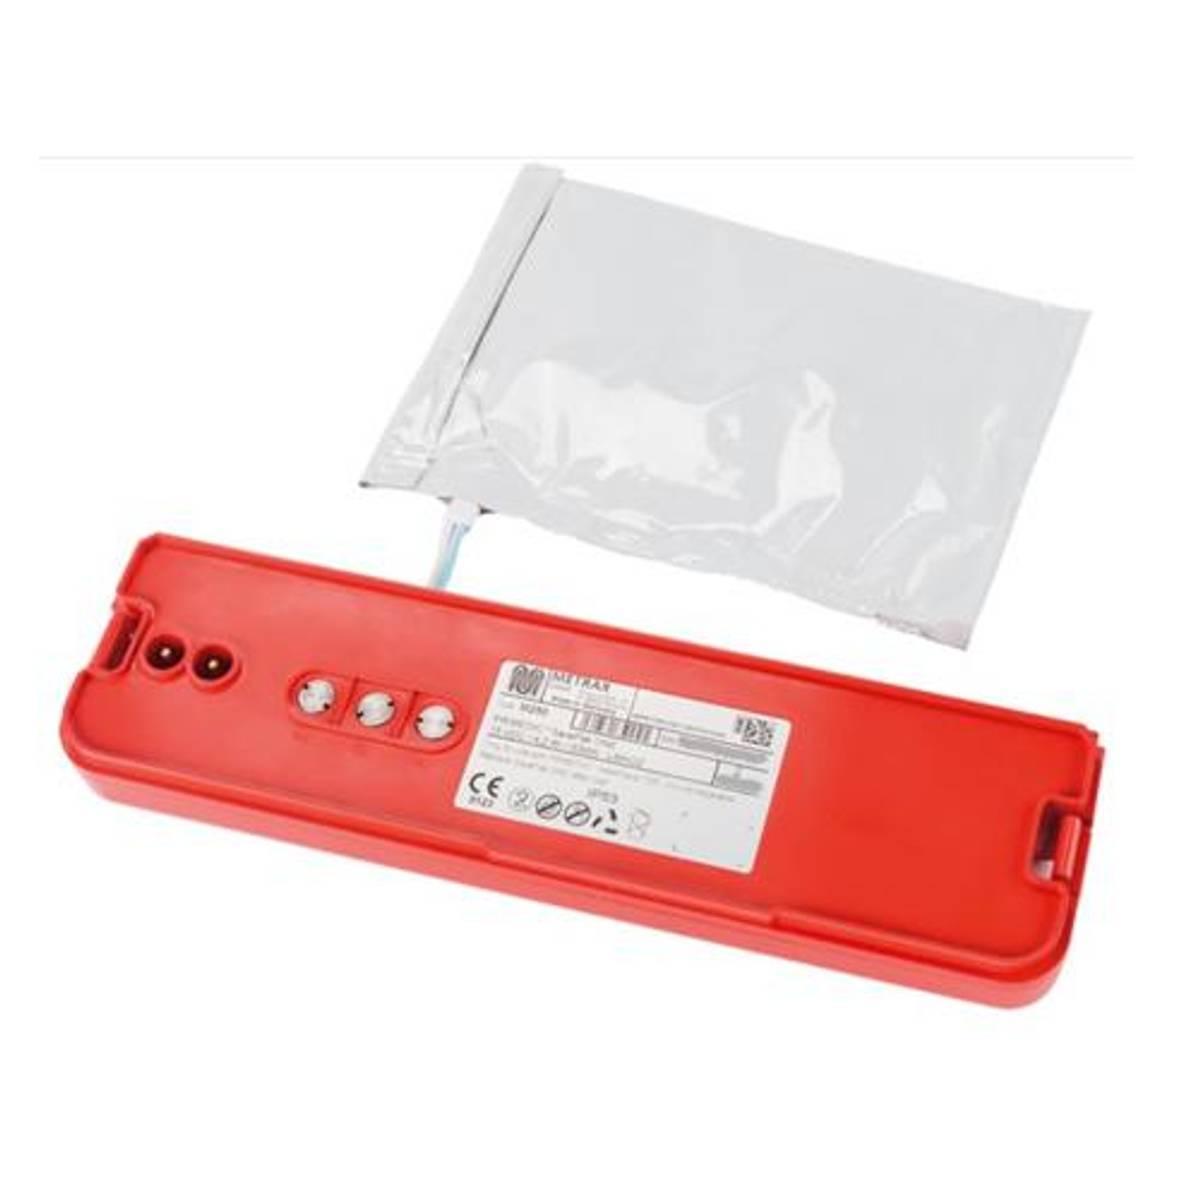 Primedic SavePak One - elektroder og batteri i én